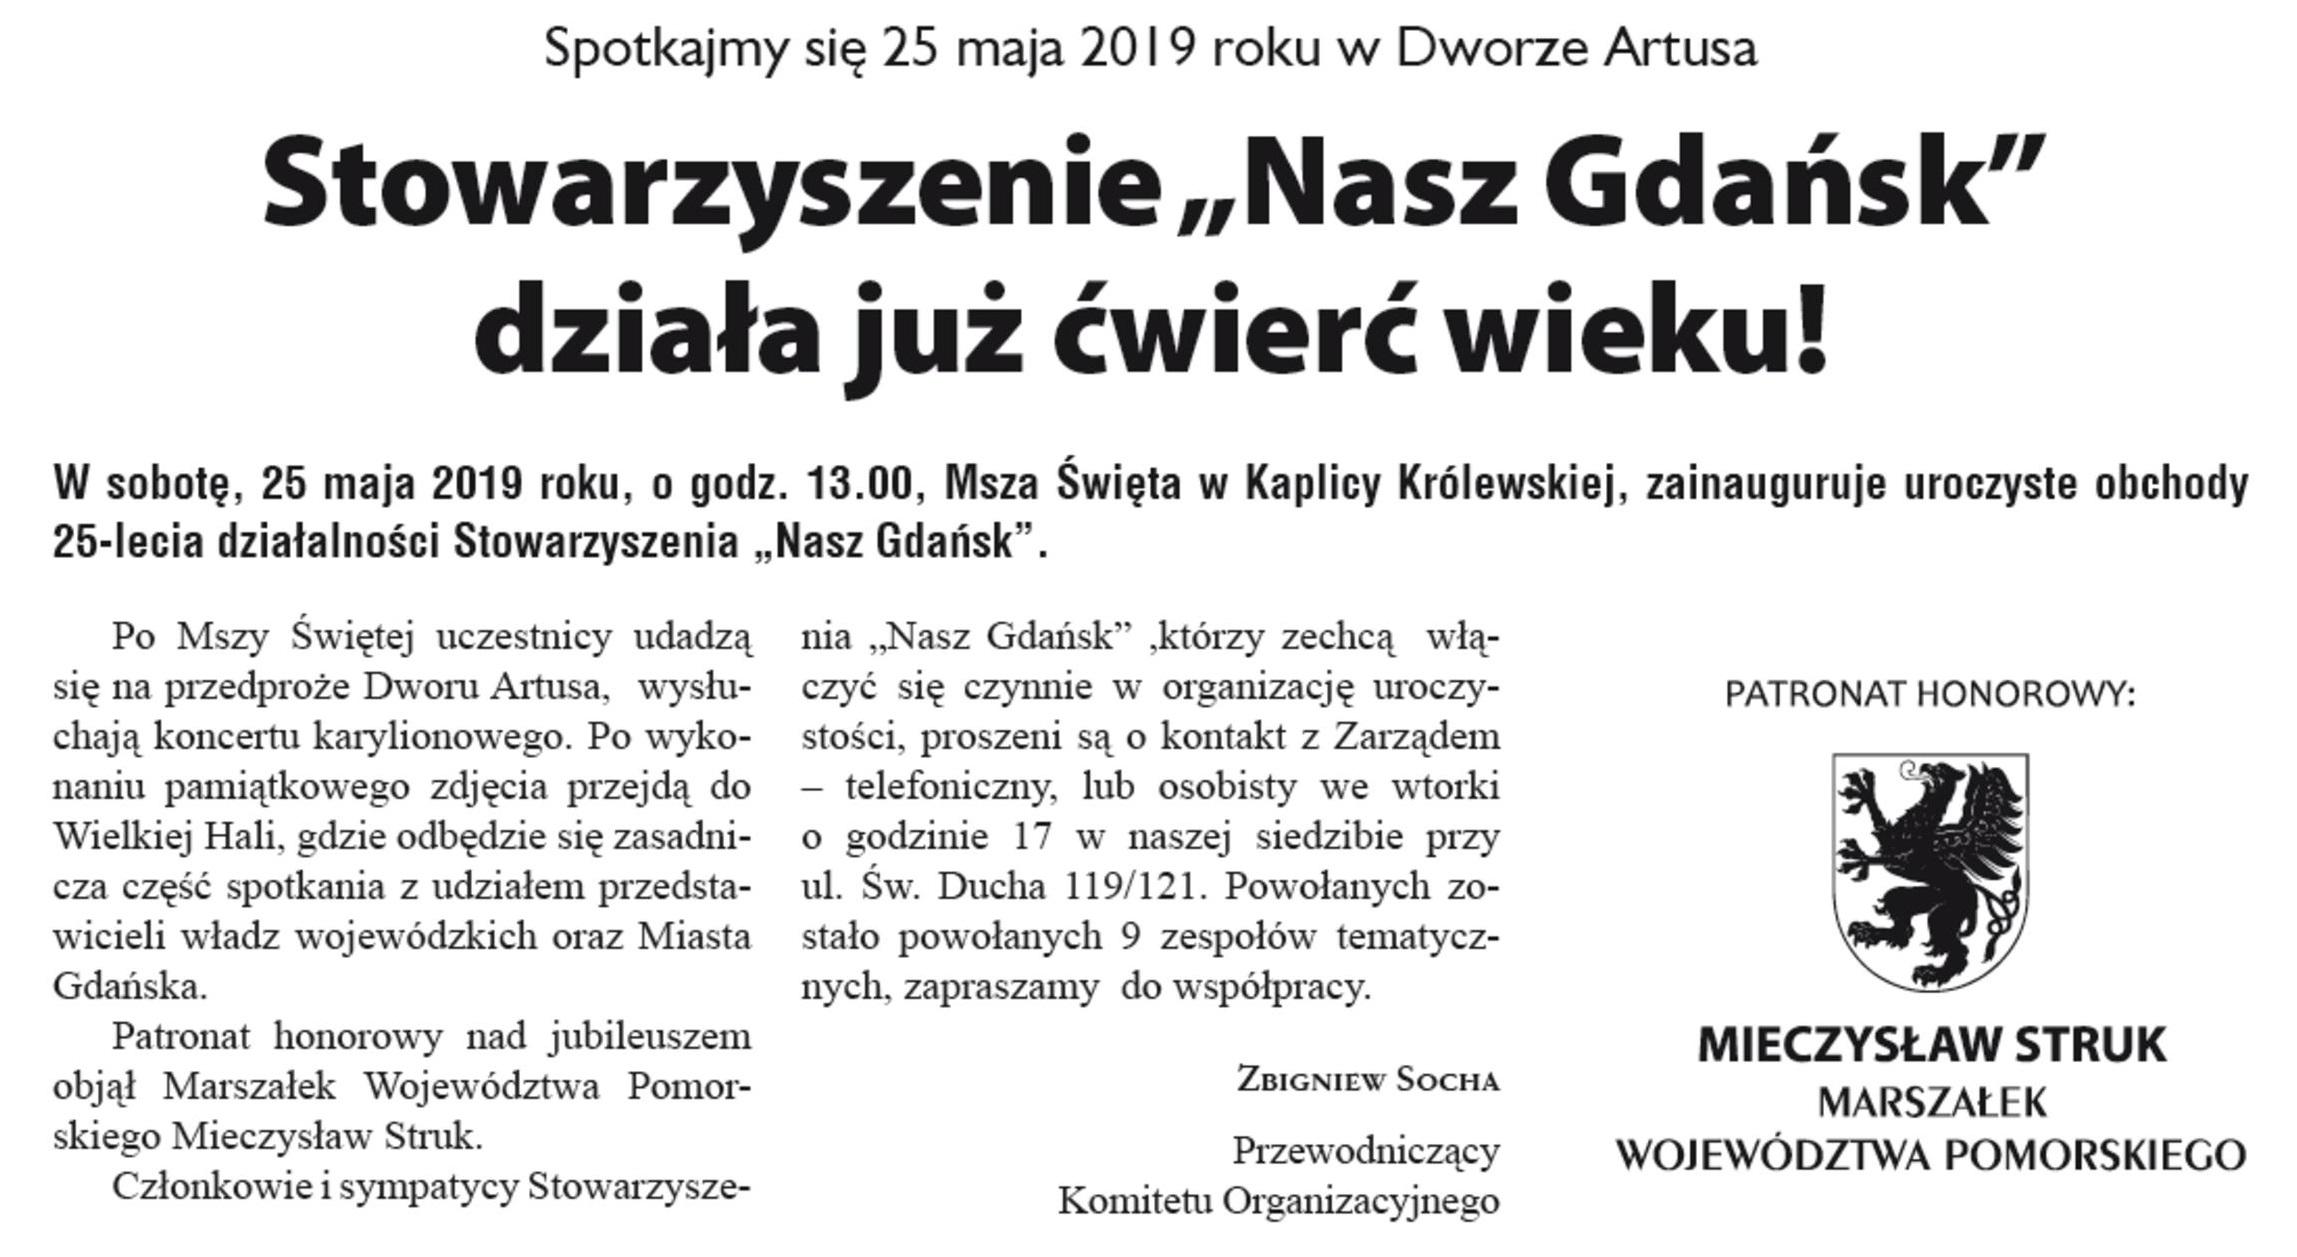 NG V 2019 netu-page-006 kadr